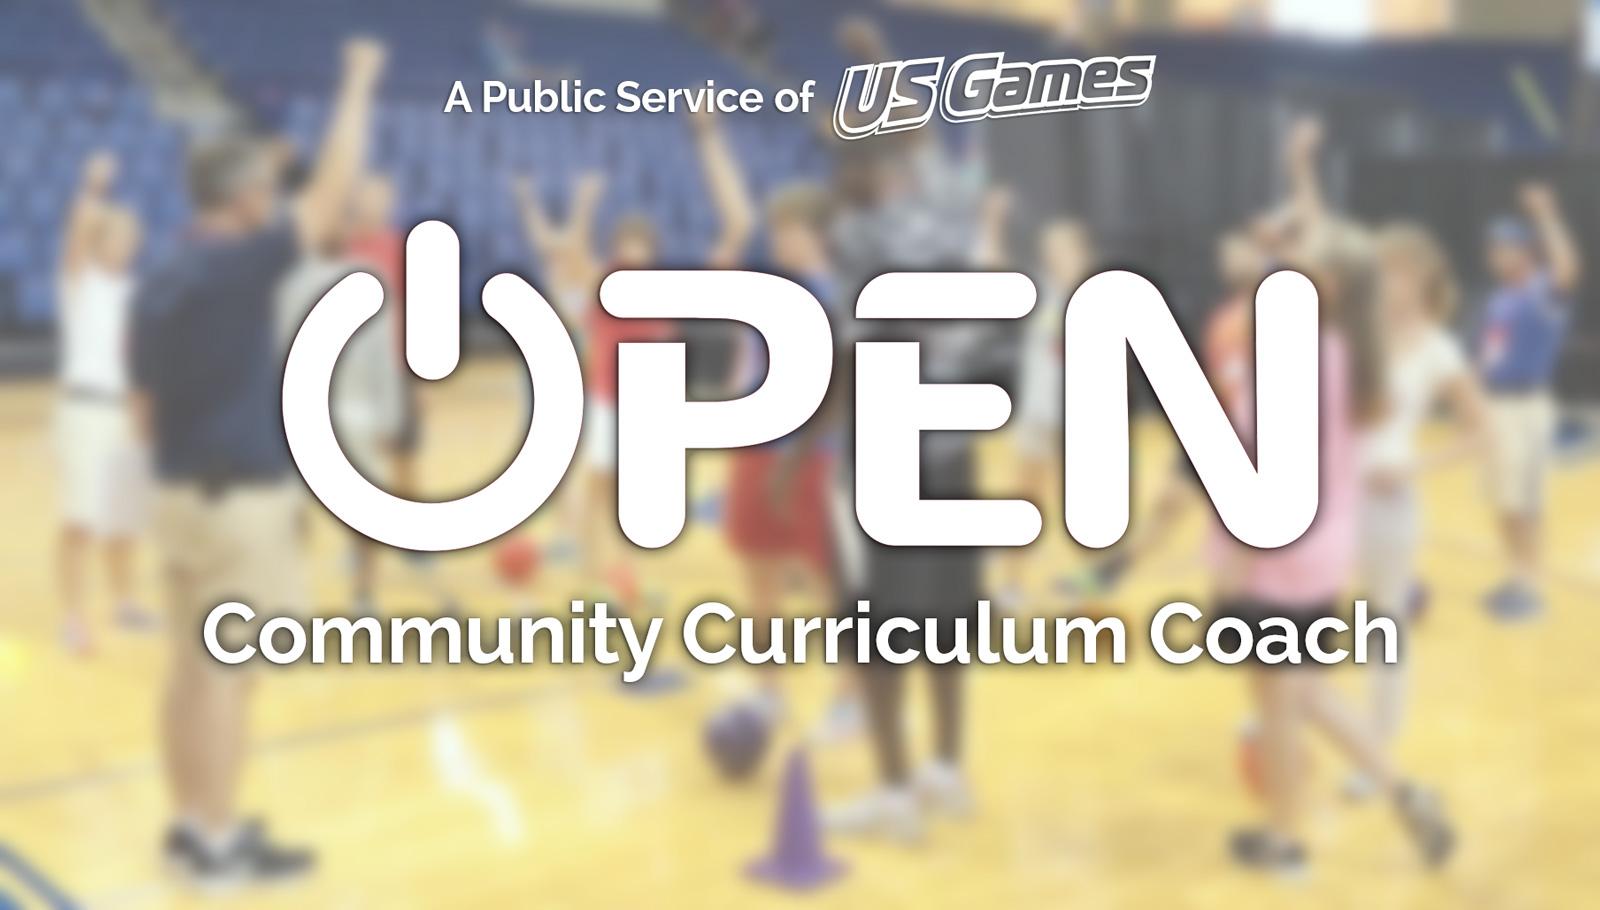 What's Next?OPEN Community Curriculum Coach Development